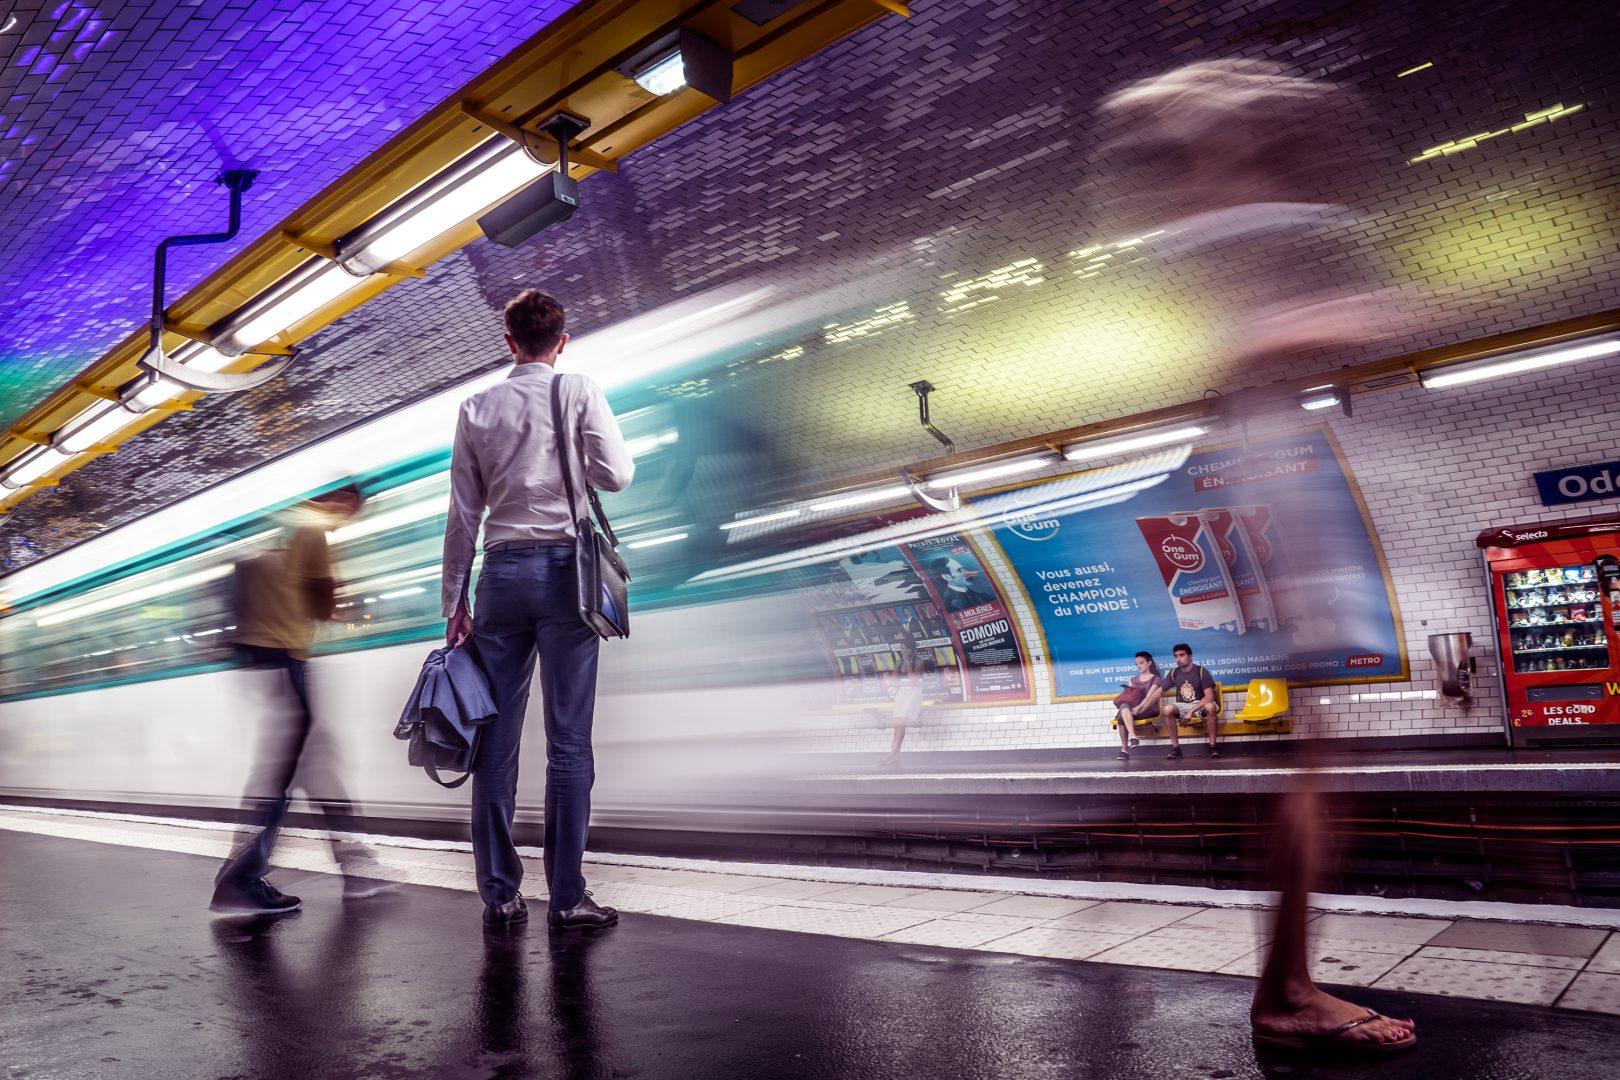 Odeon Subwaystation